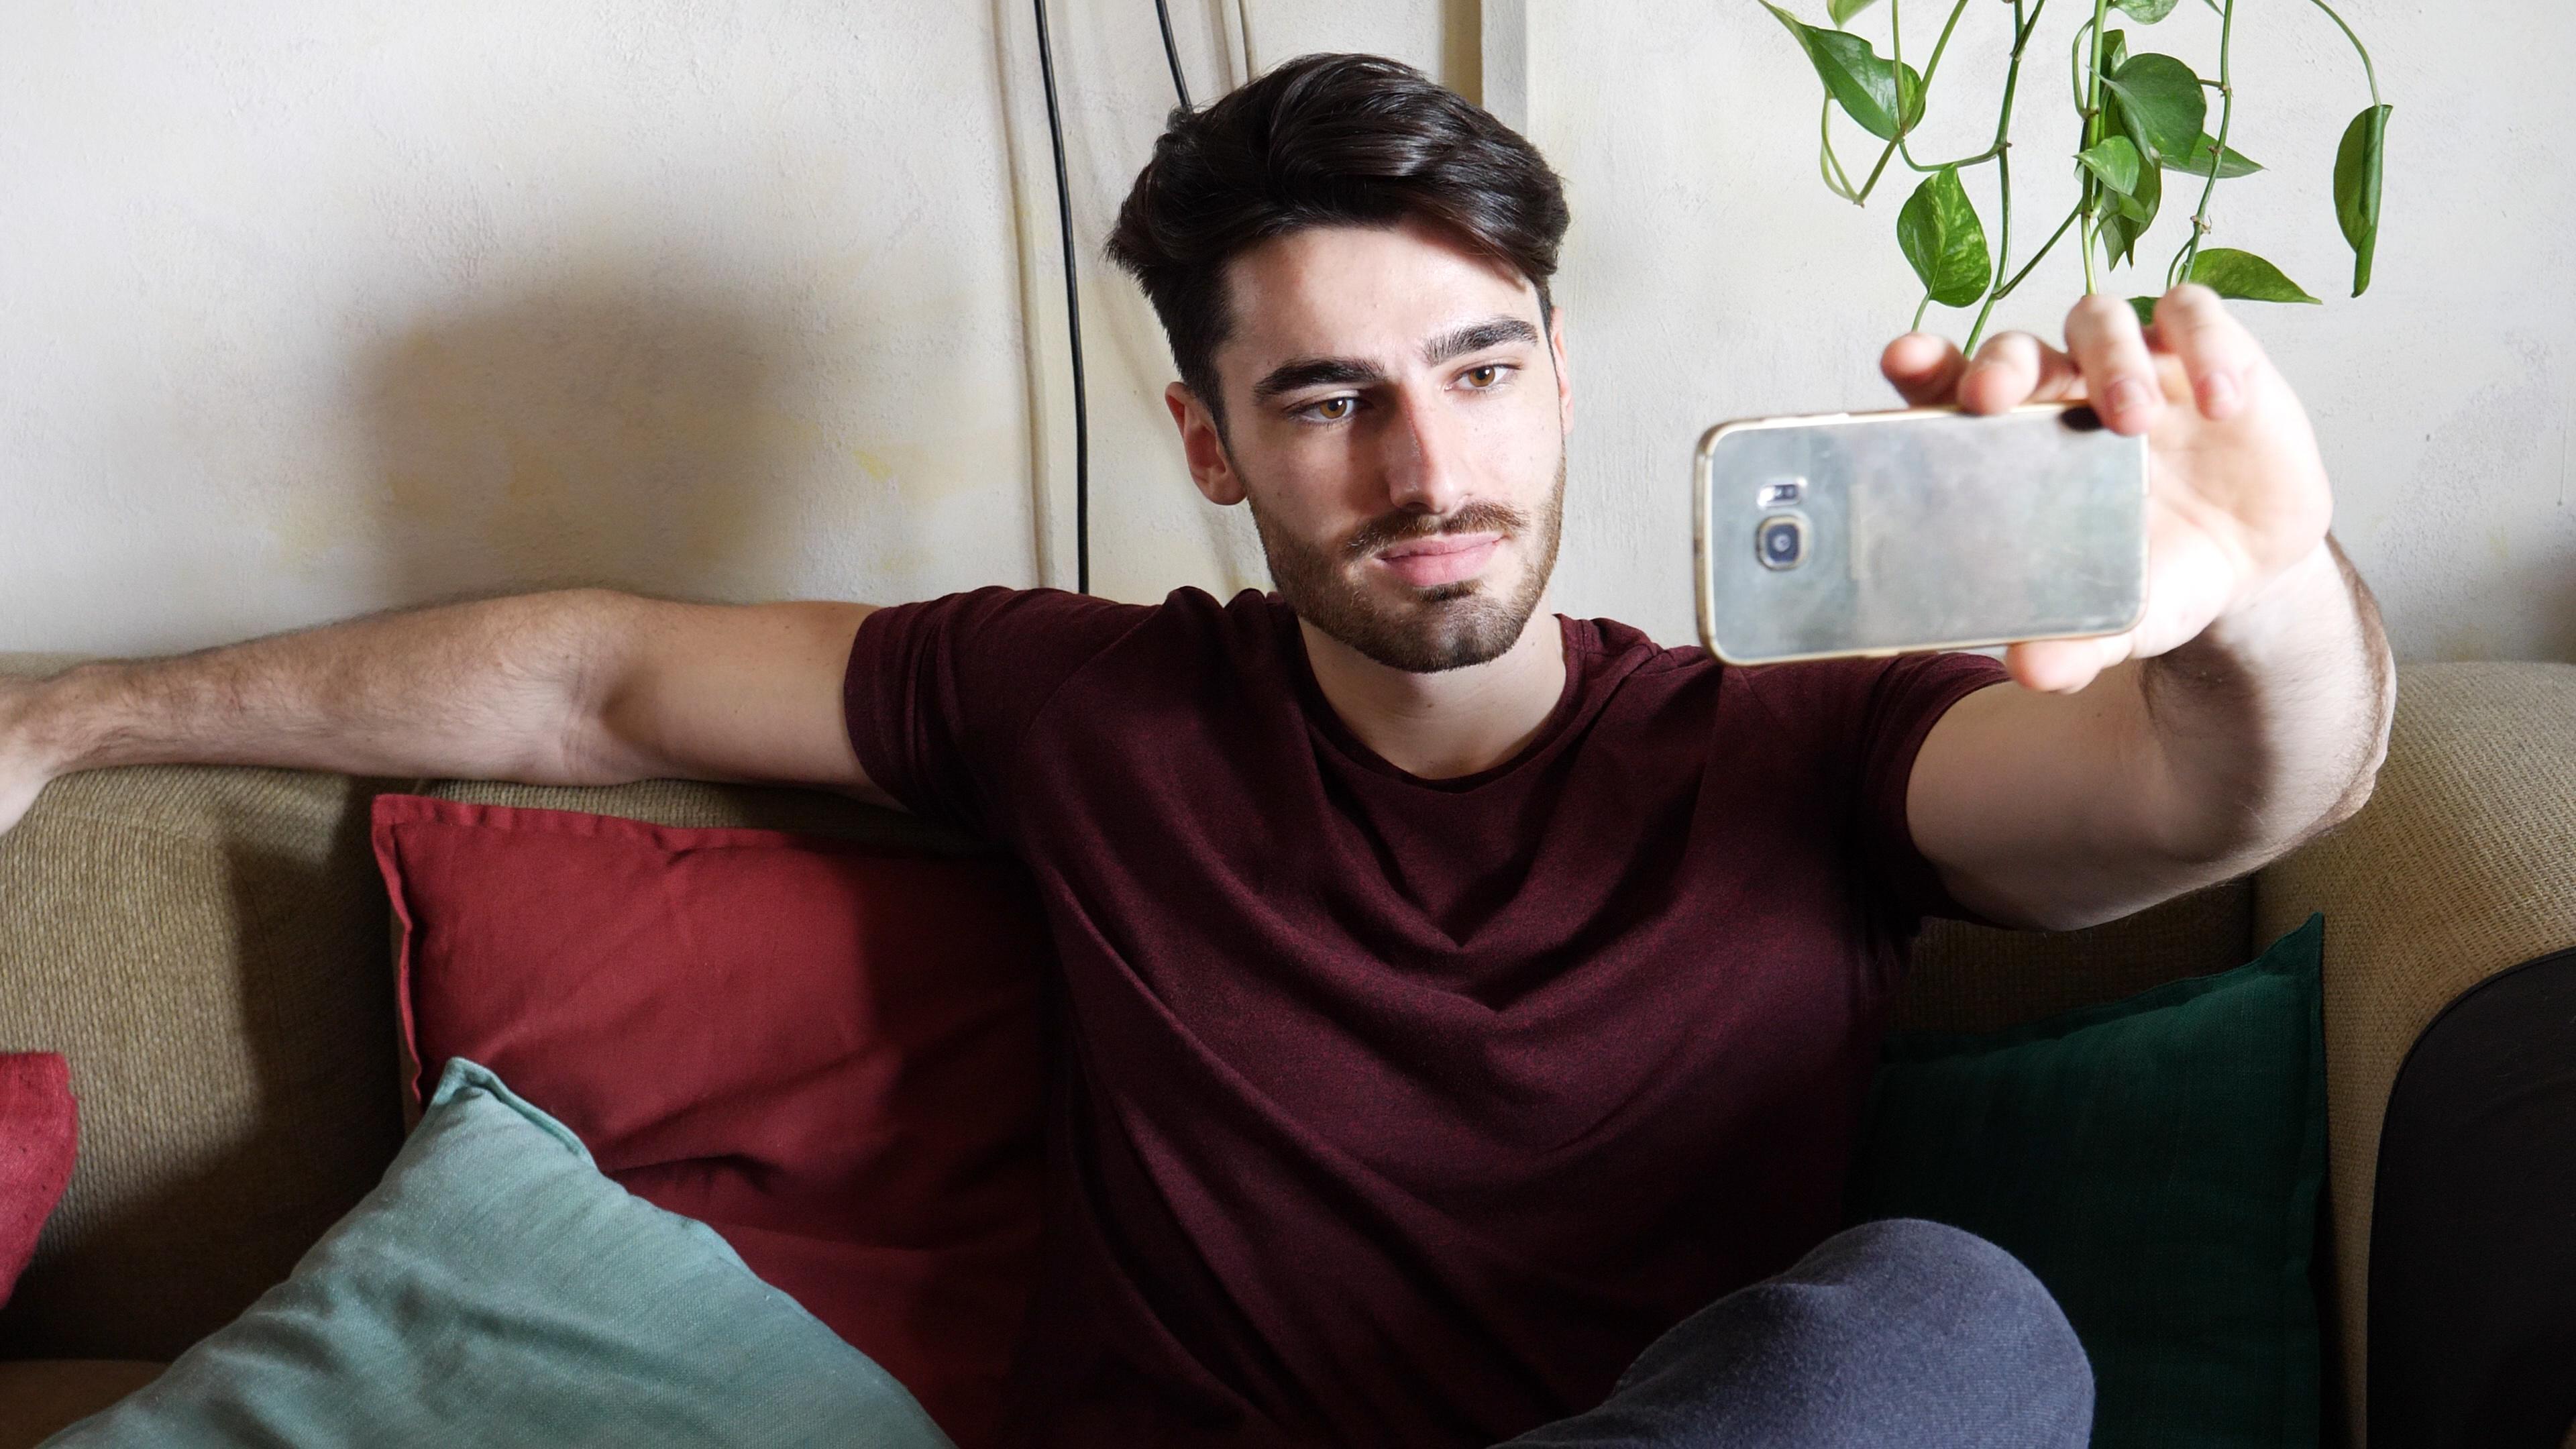 Gaydar dating Irland